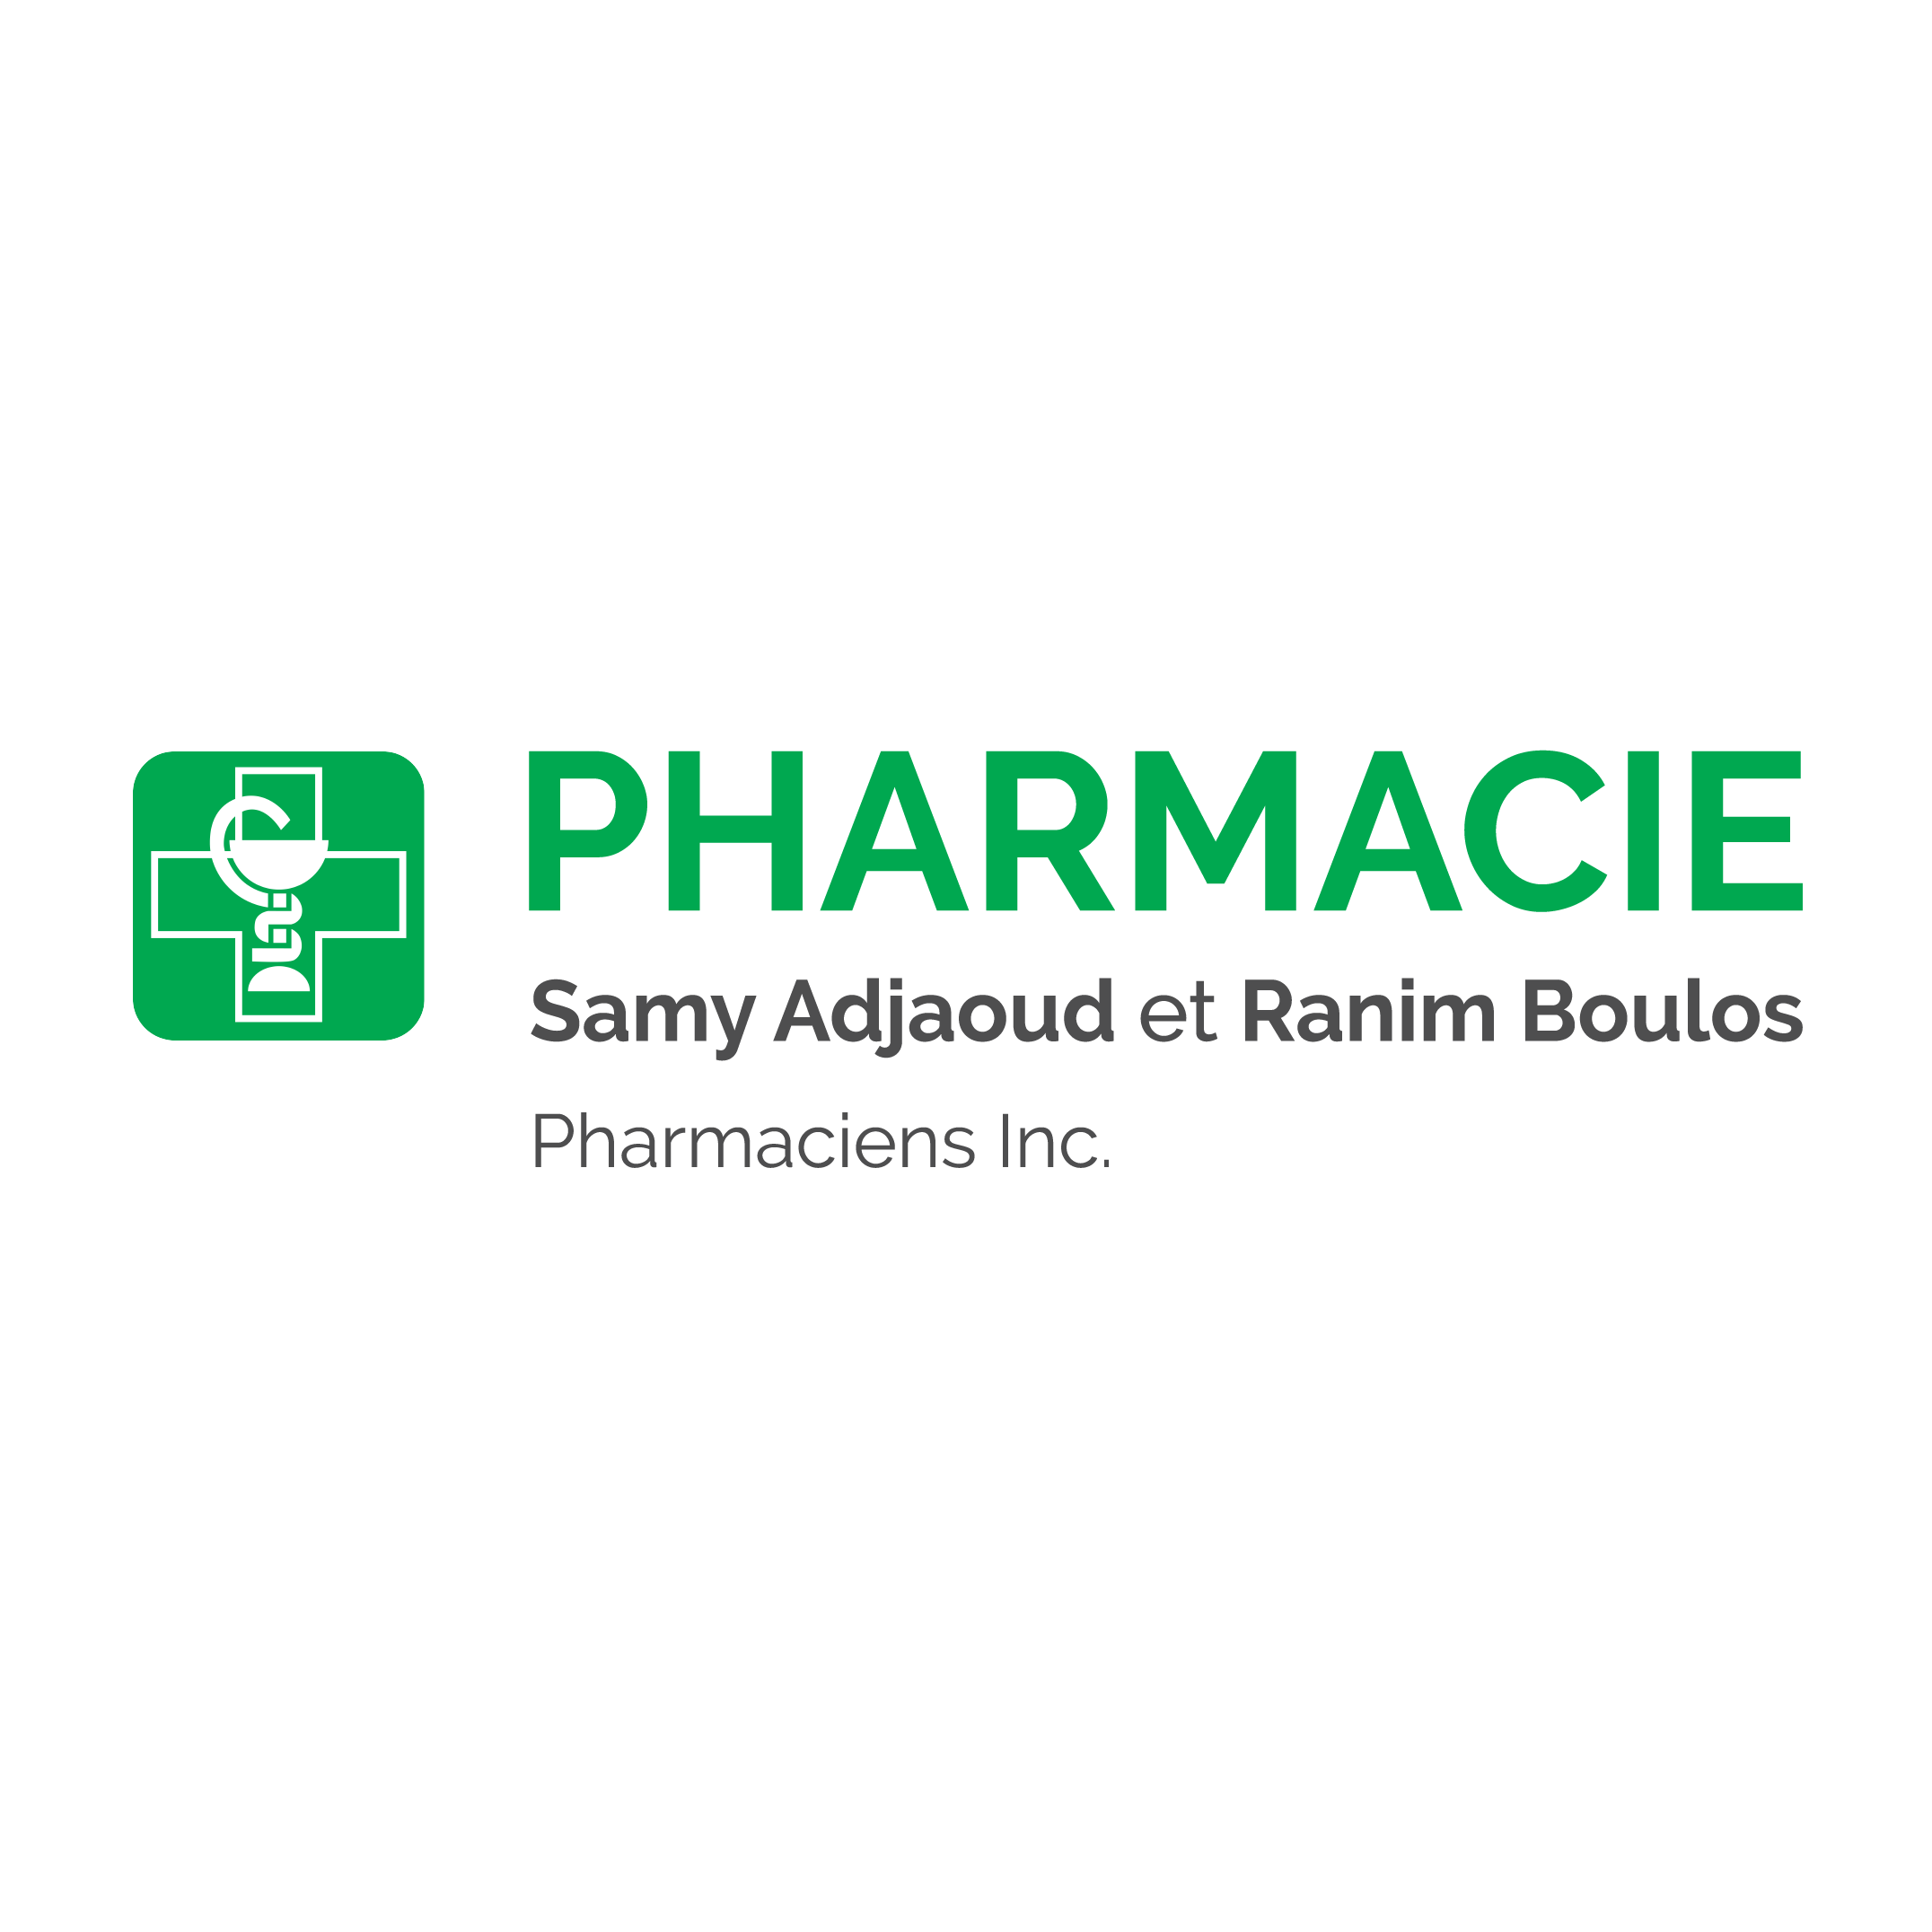 Samy Adjaoud et Ranim Boulos Pharmaciens Inc.